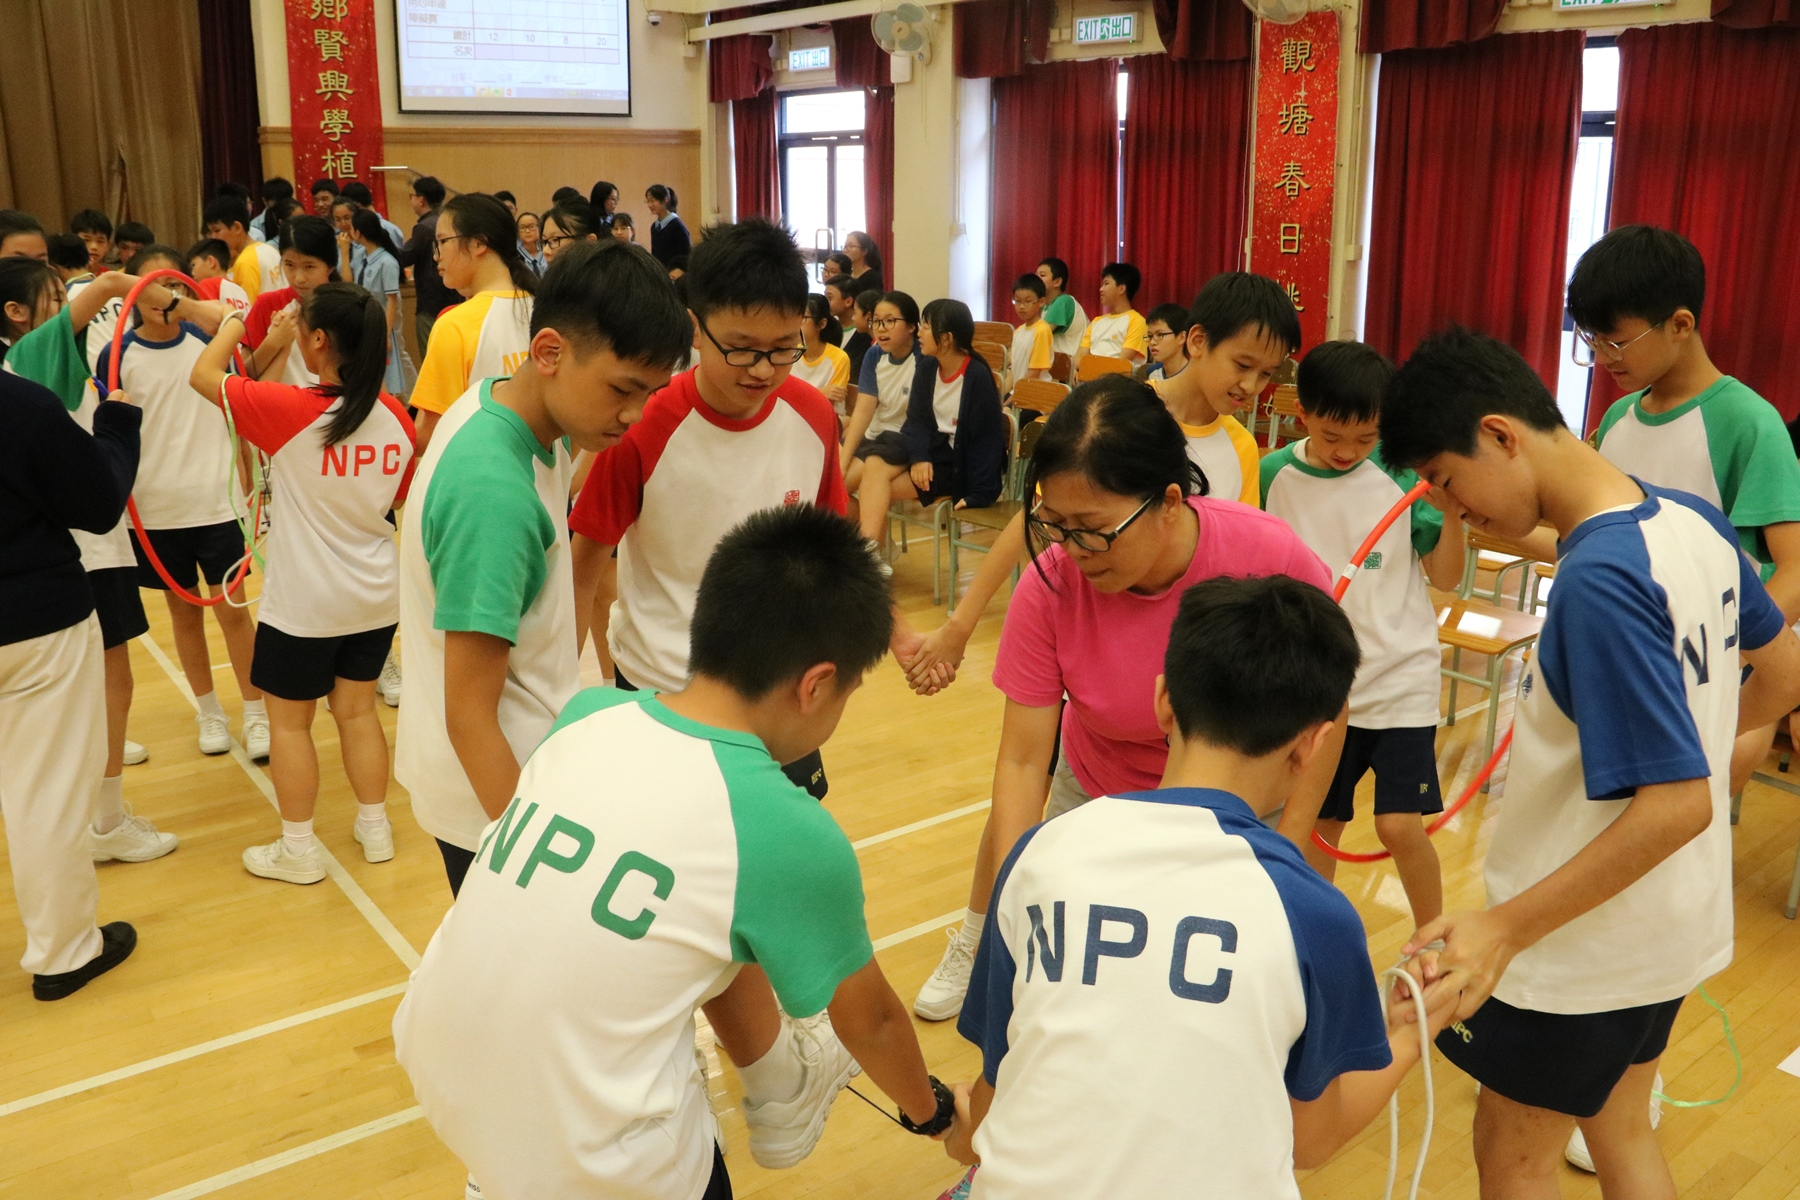 http://npc.edu.hk/sites/default/files/img_6411.jpg